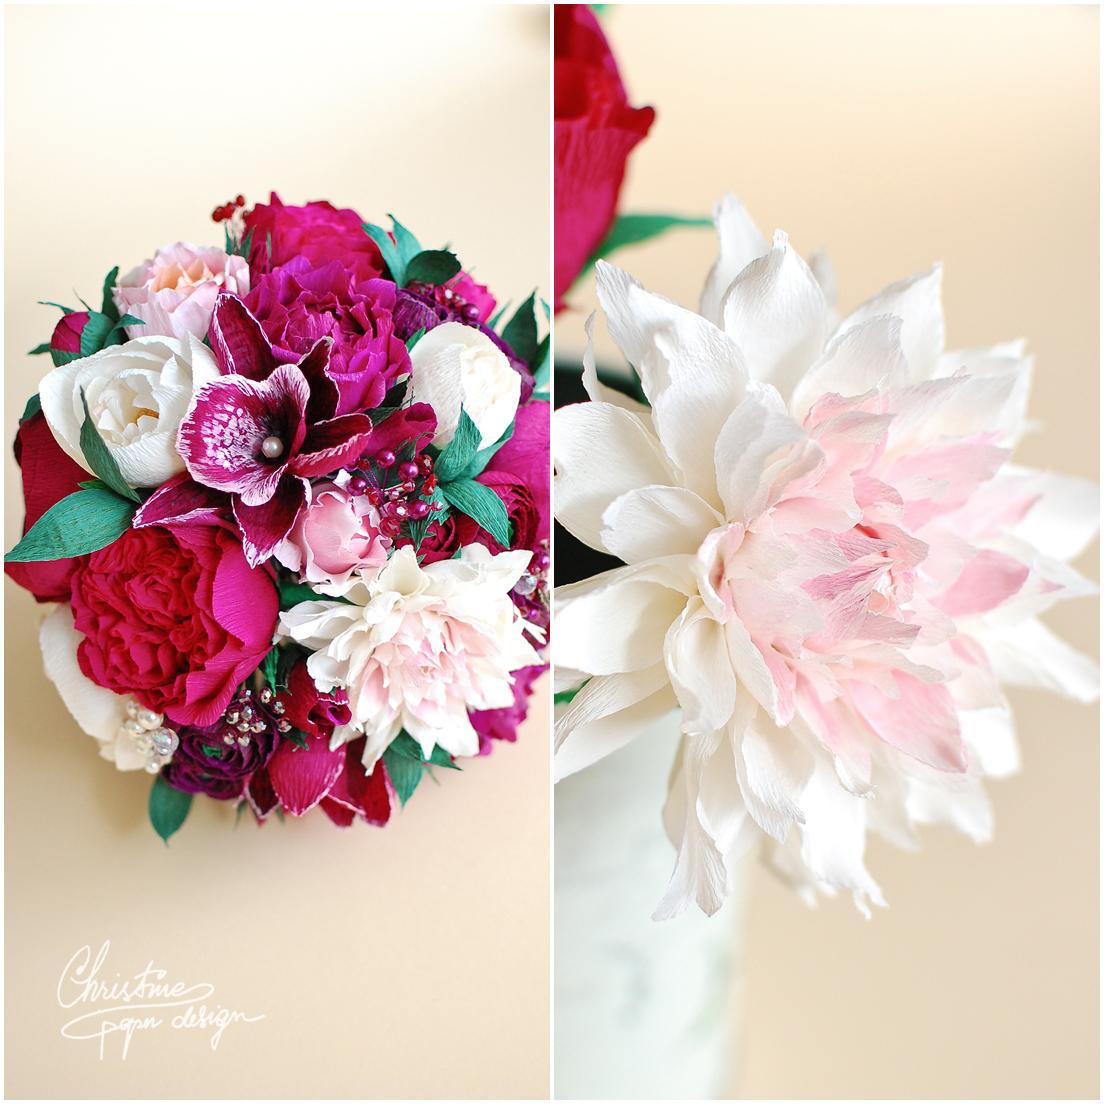 4Christine paper design - paper flowers, paper dahlia